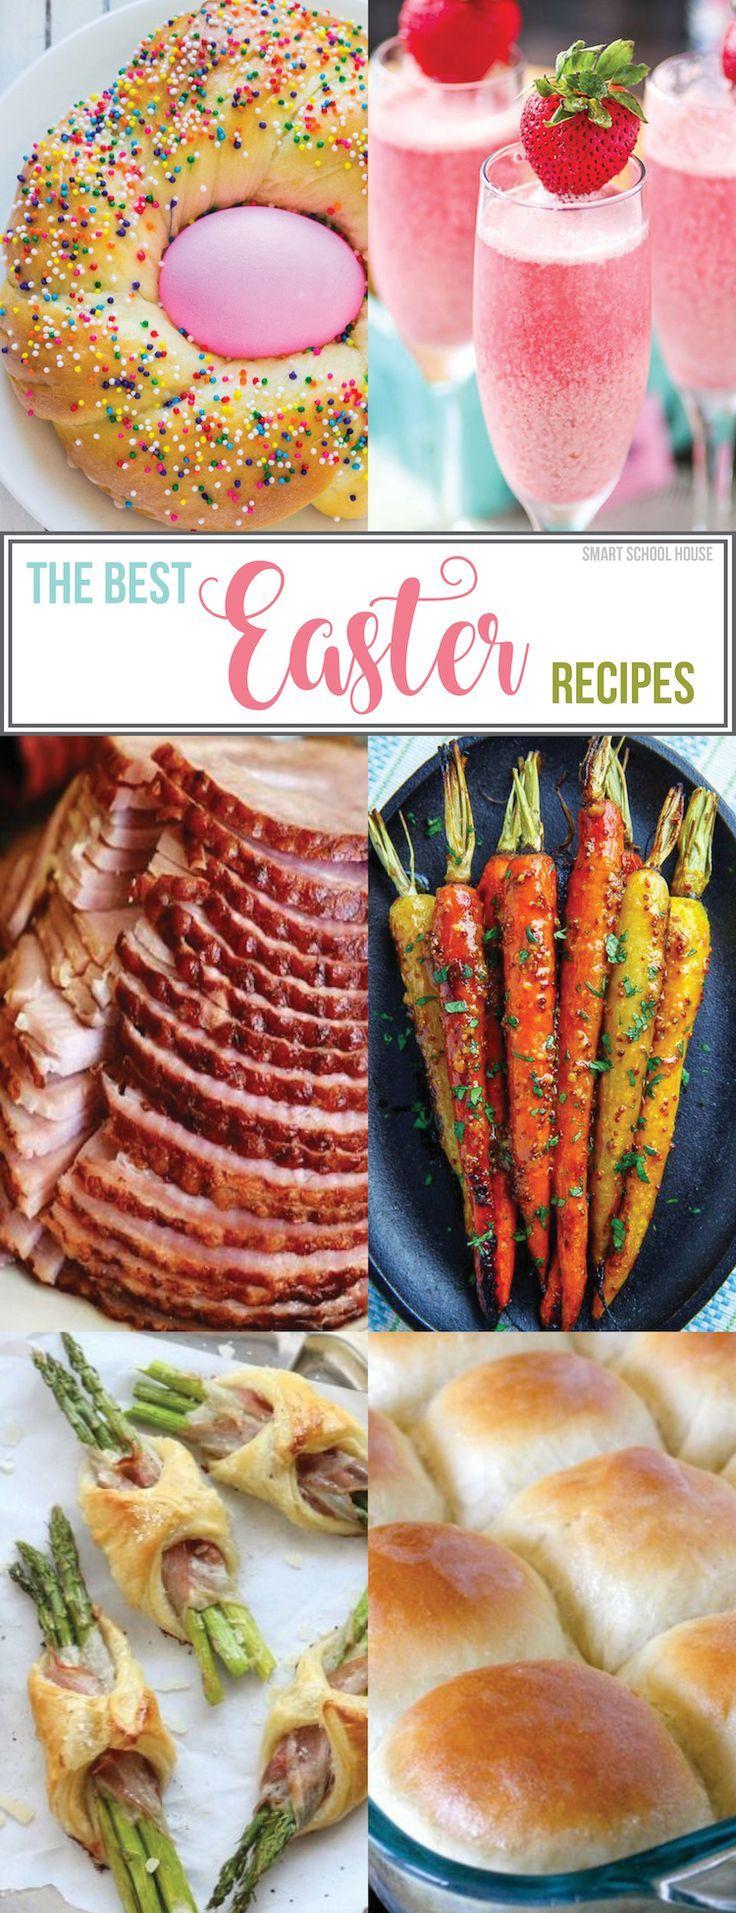 The Best Easter Recipes Jennifer Fishkind {Princess Pinky Girl}